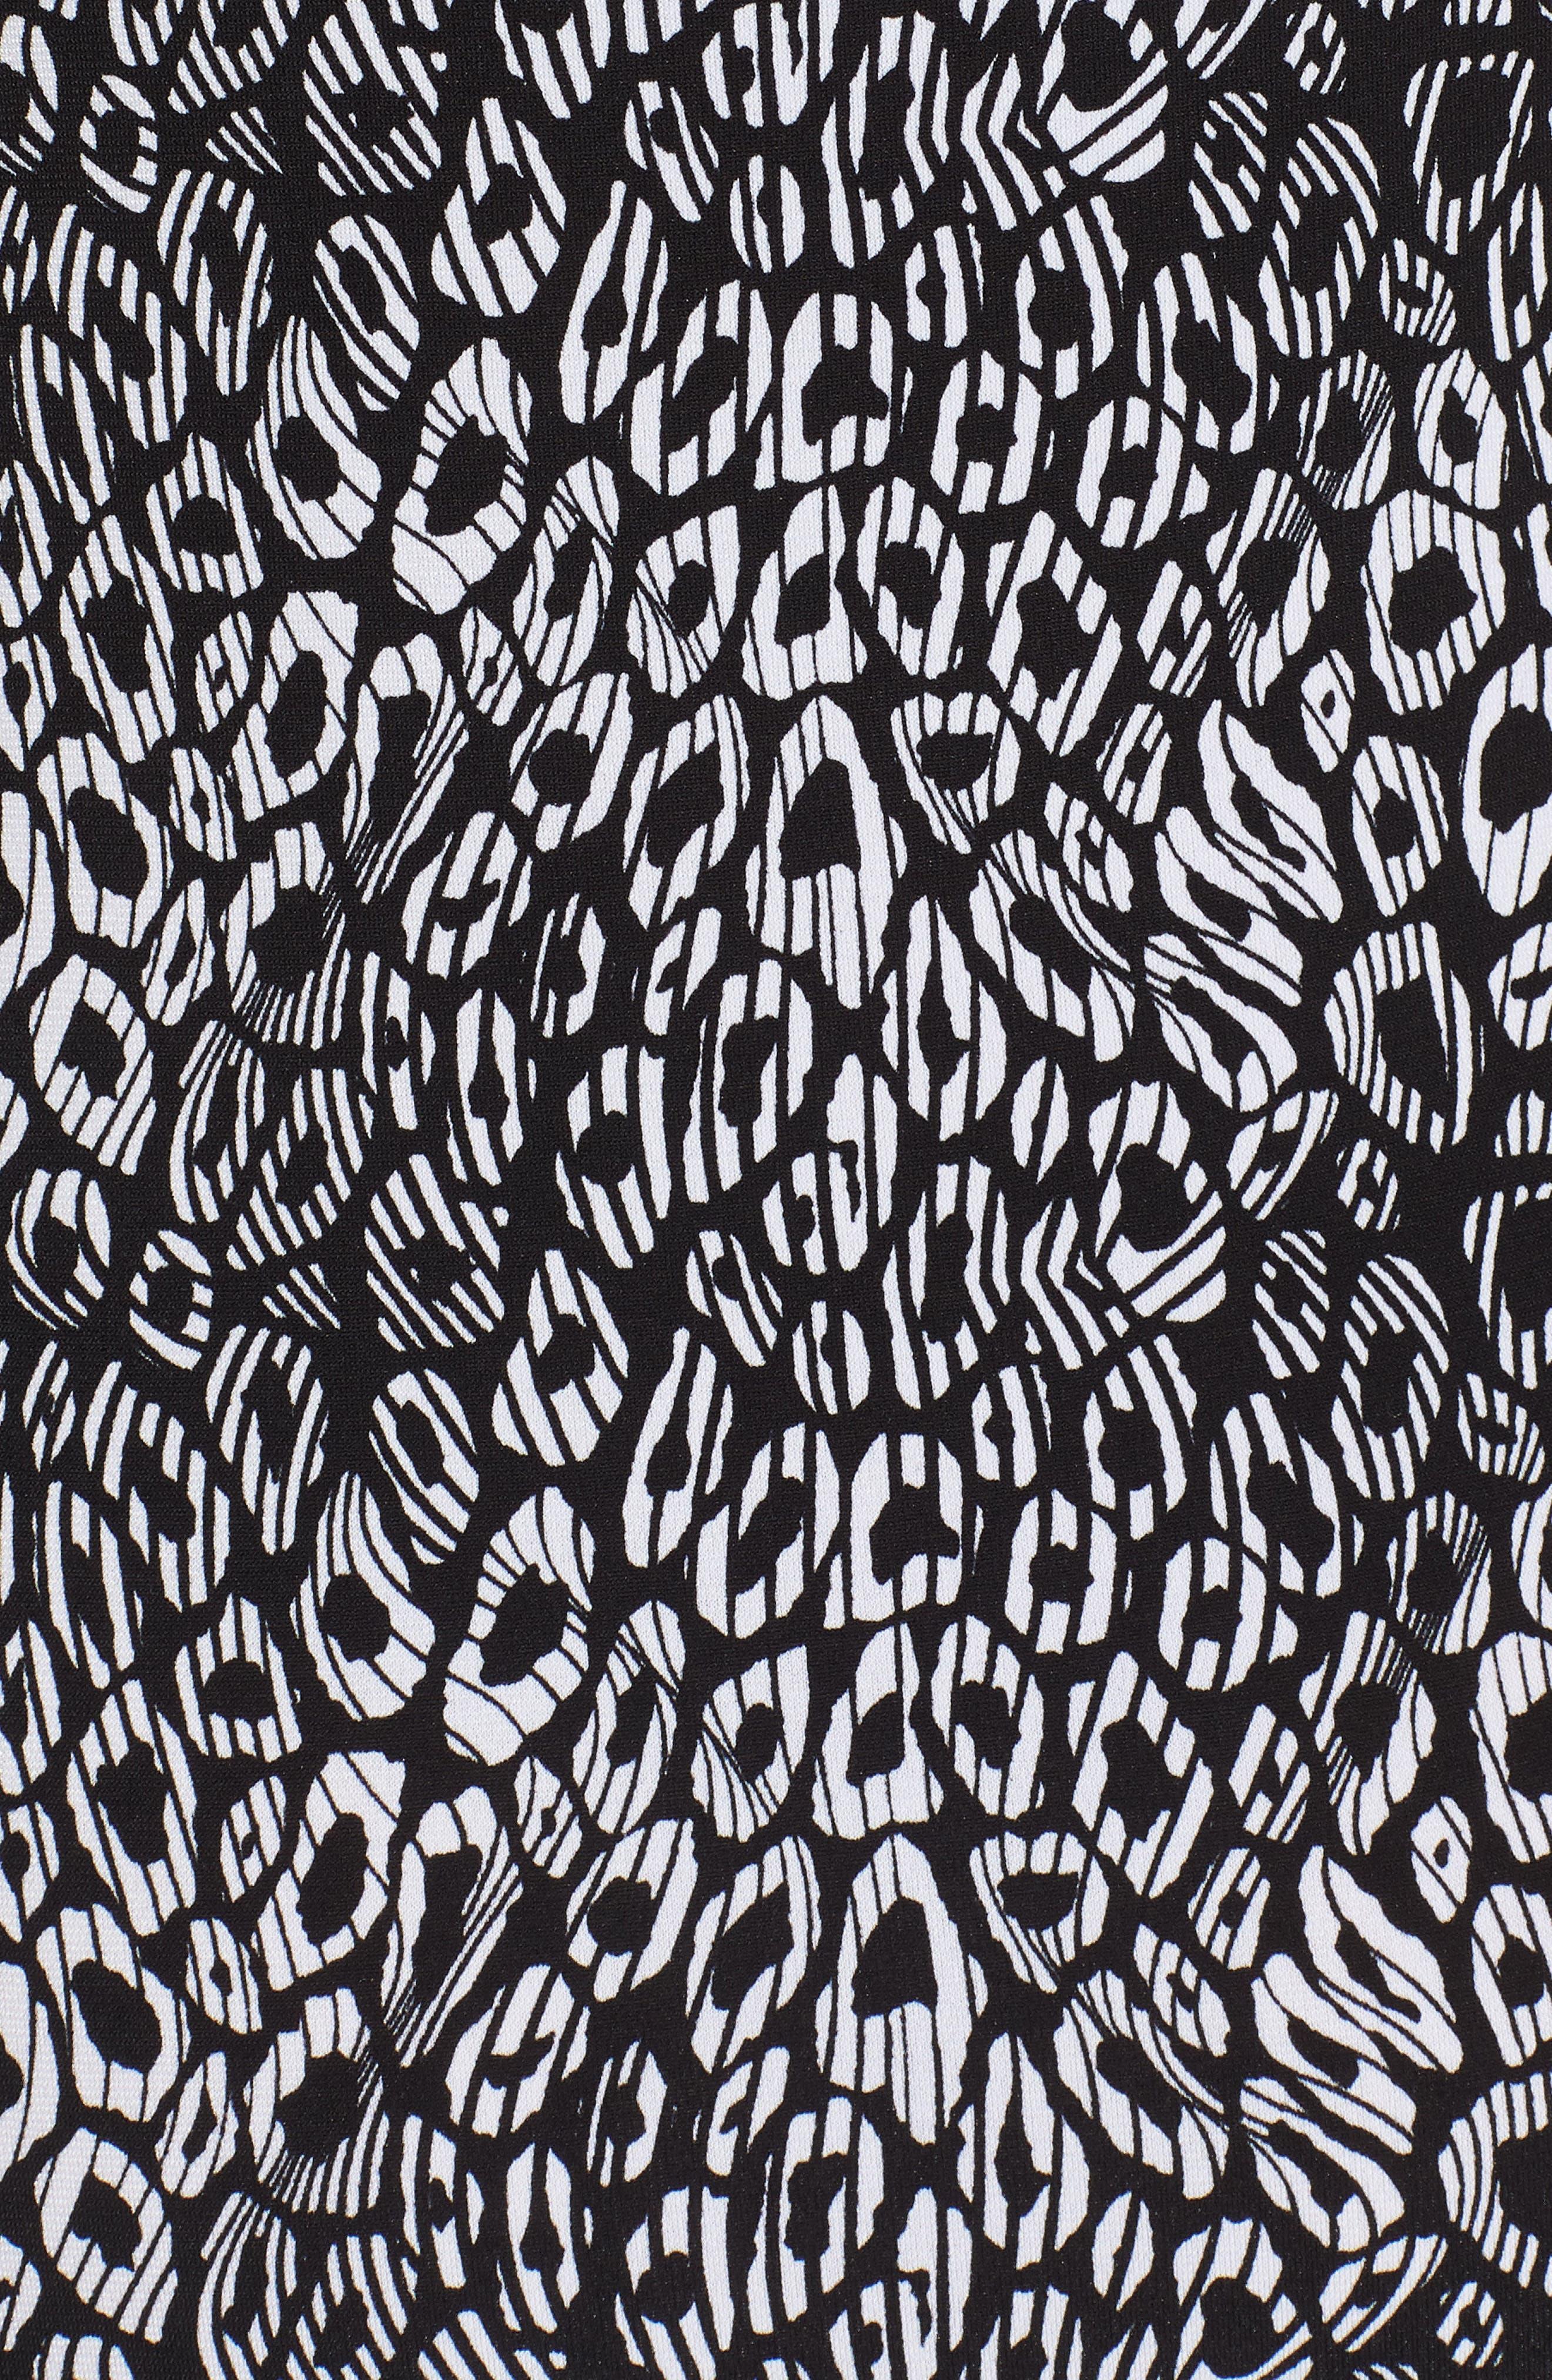 Wavy Leopard Print Tank Maxi Dress,                             Alternate thumbnail 6, color,                             Black/ White